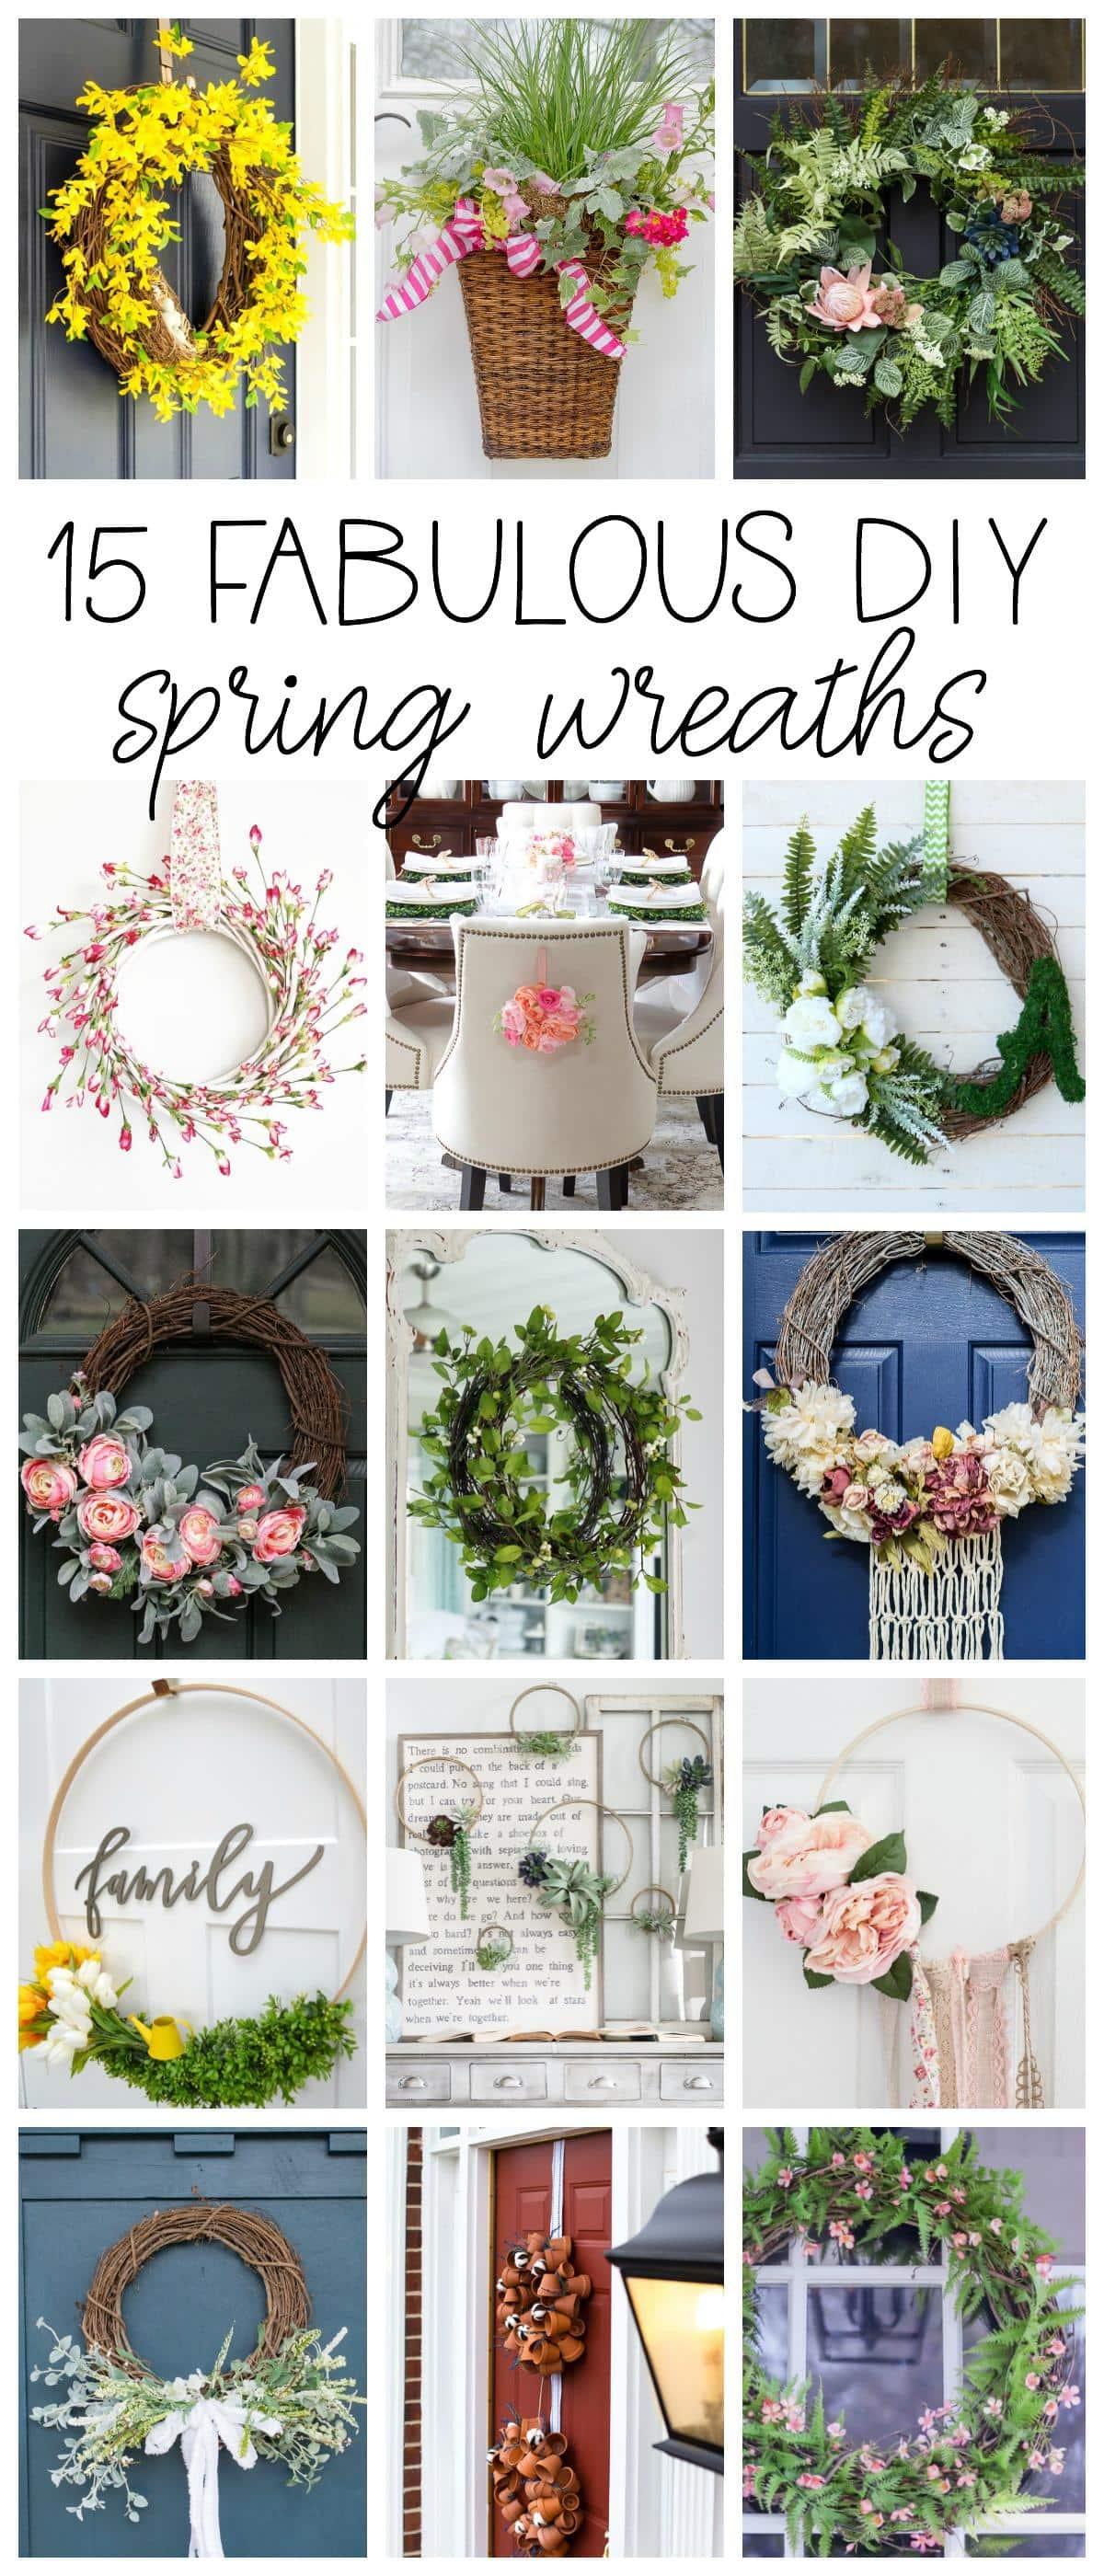 15 Fabulous DIY Spring Wreaths